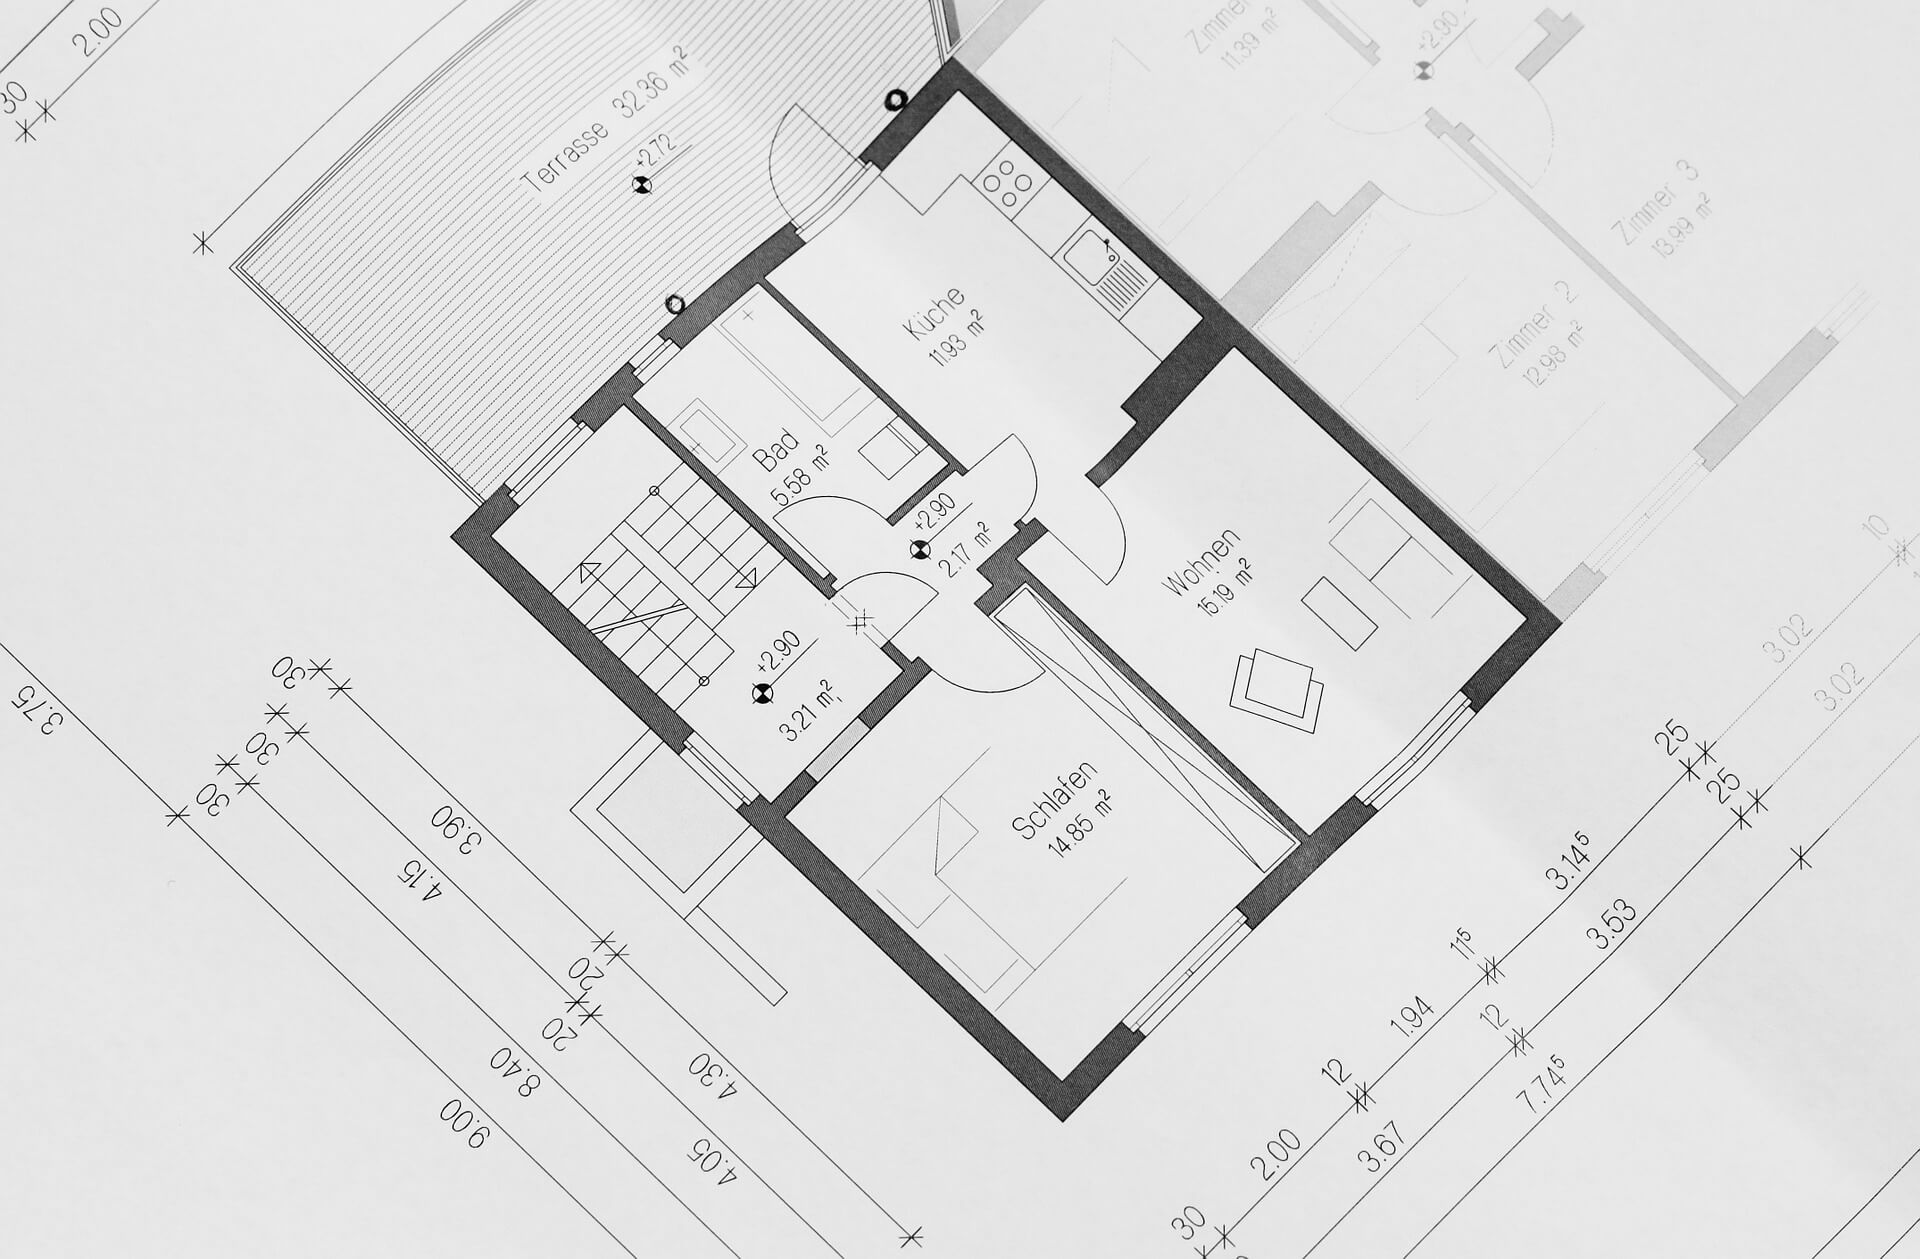 building-plan-354233_1920 店舗デザインの料金はどのくらい?具体的な内訳を紹介いたします!